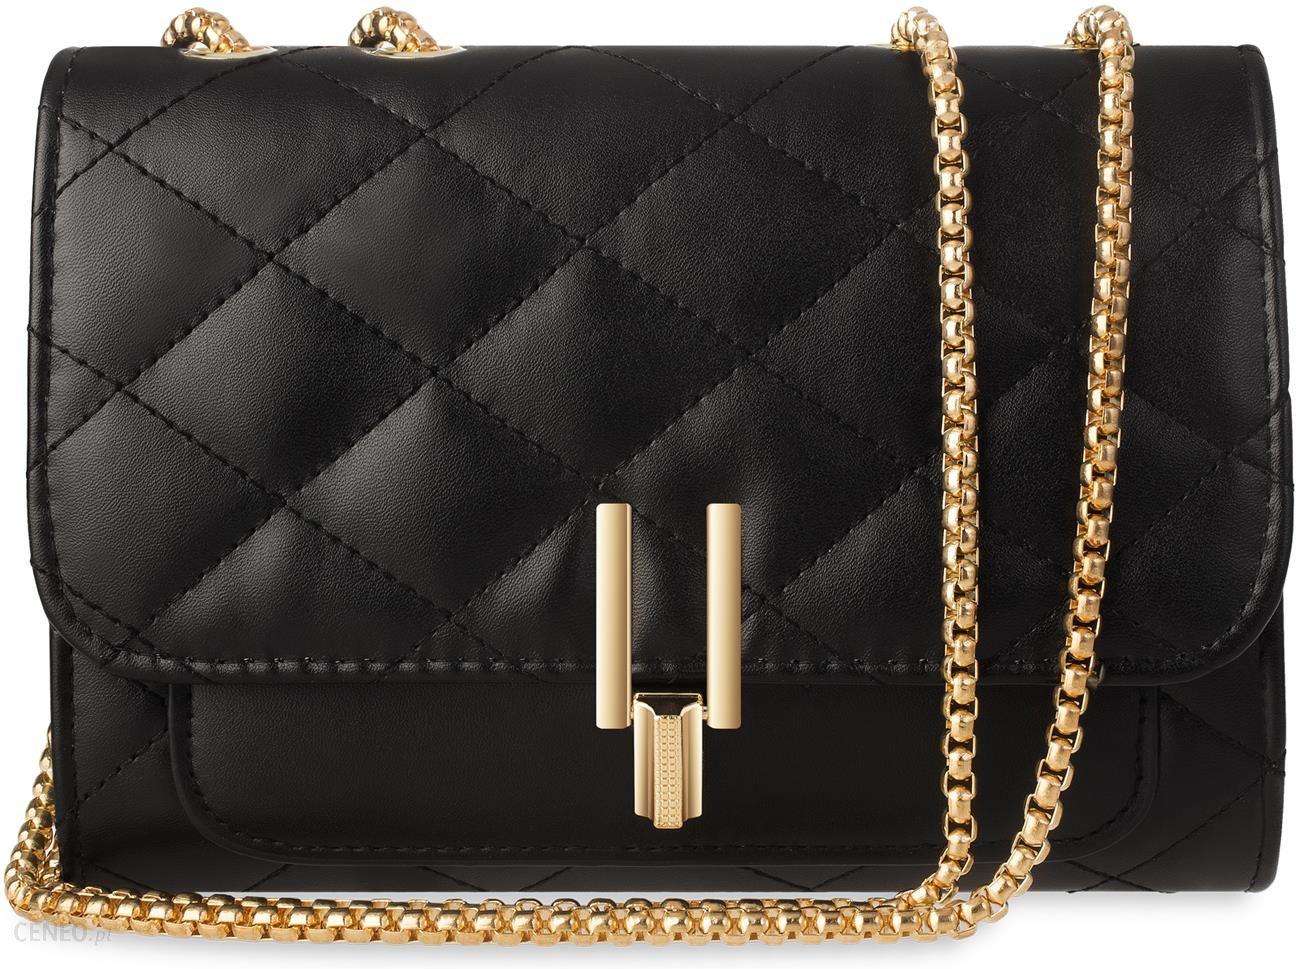 e25fb62afc81e Elegancka torebka damska pikowana chanelka kuferek na łańcuszku - czarny -  zdjęcie 1